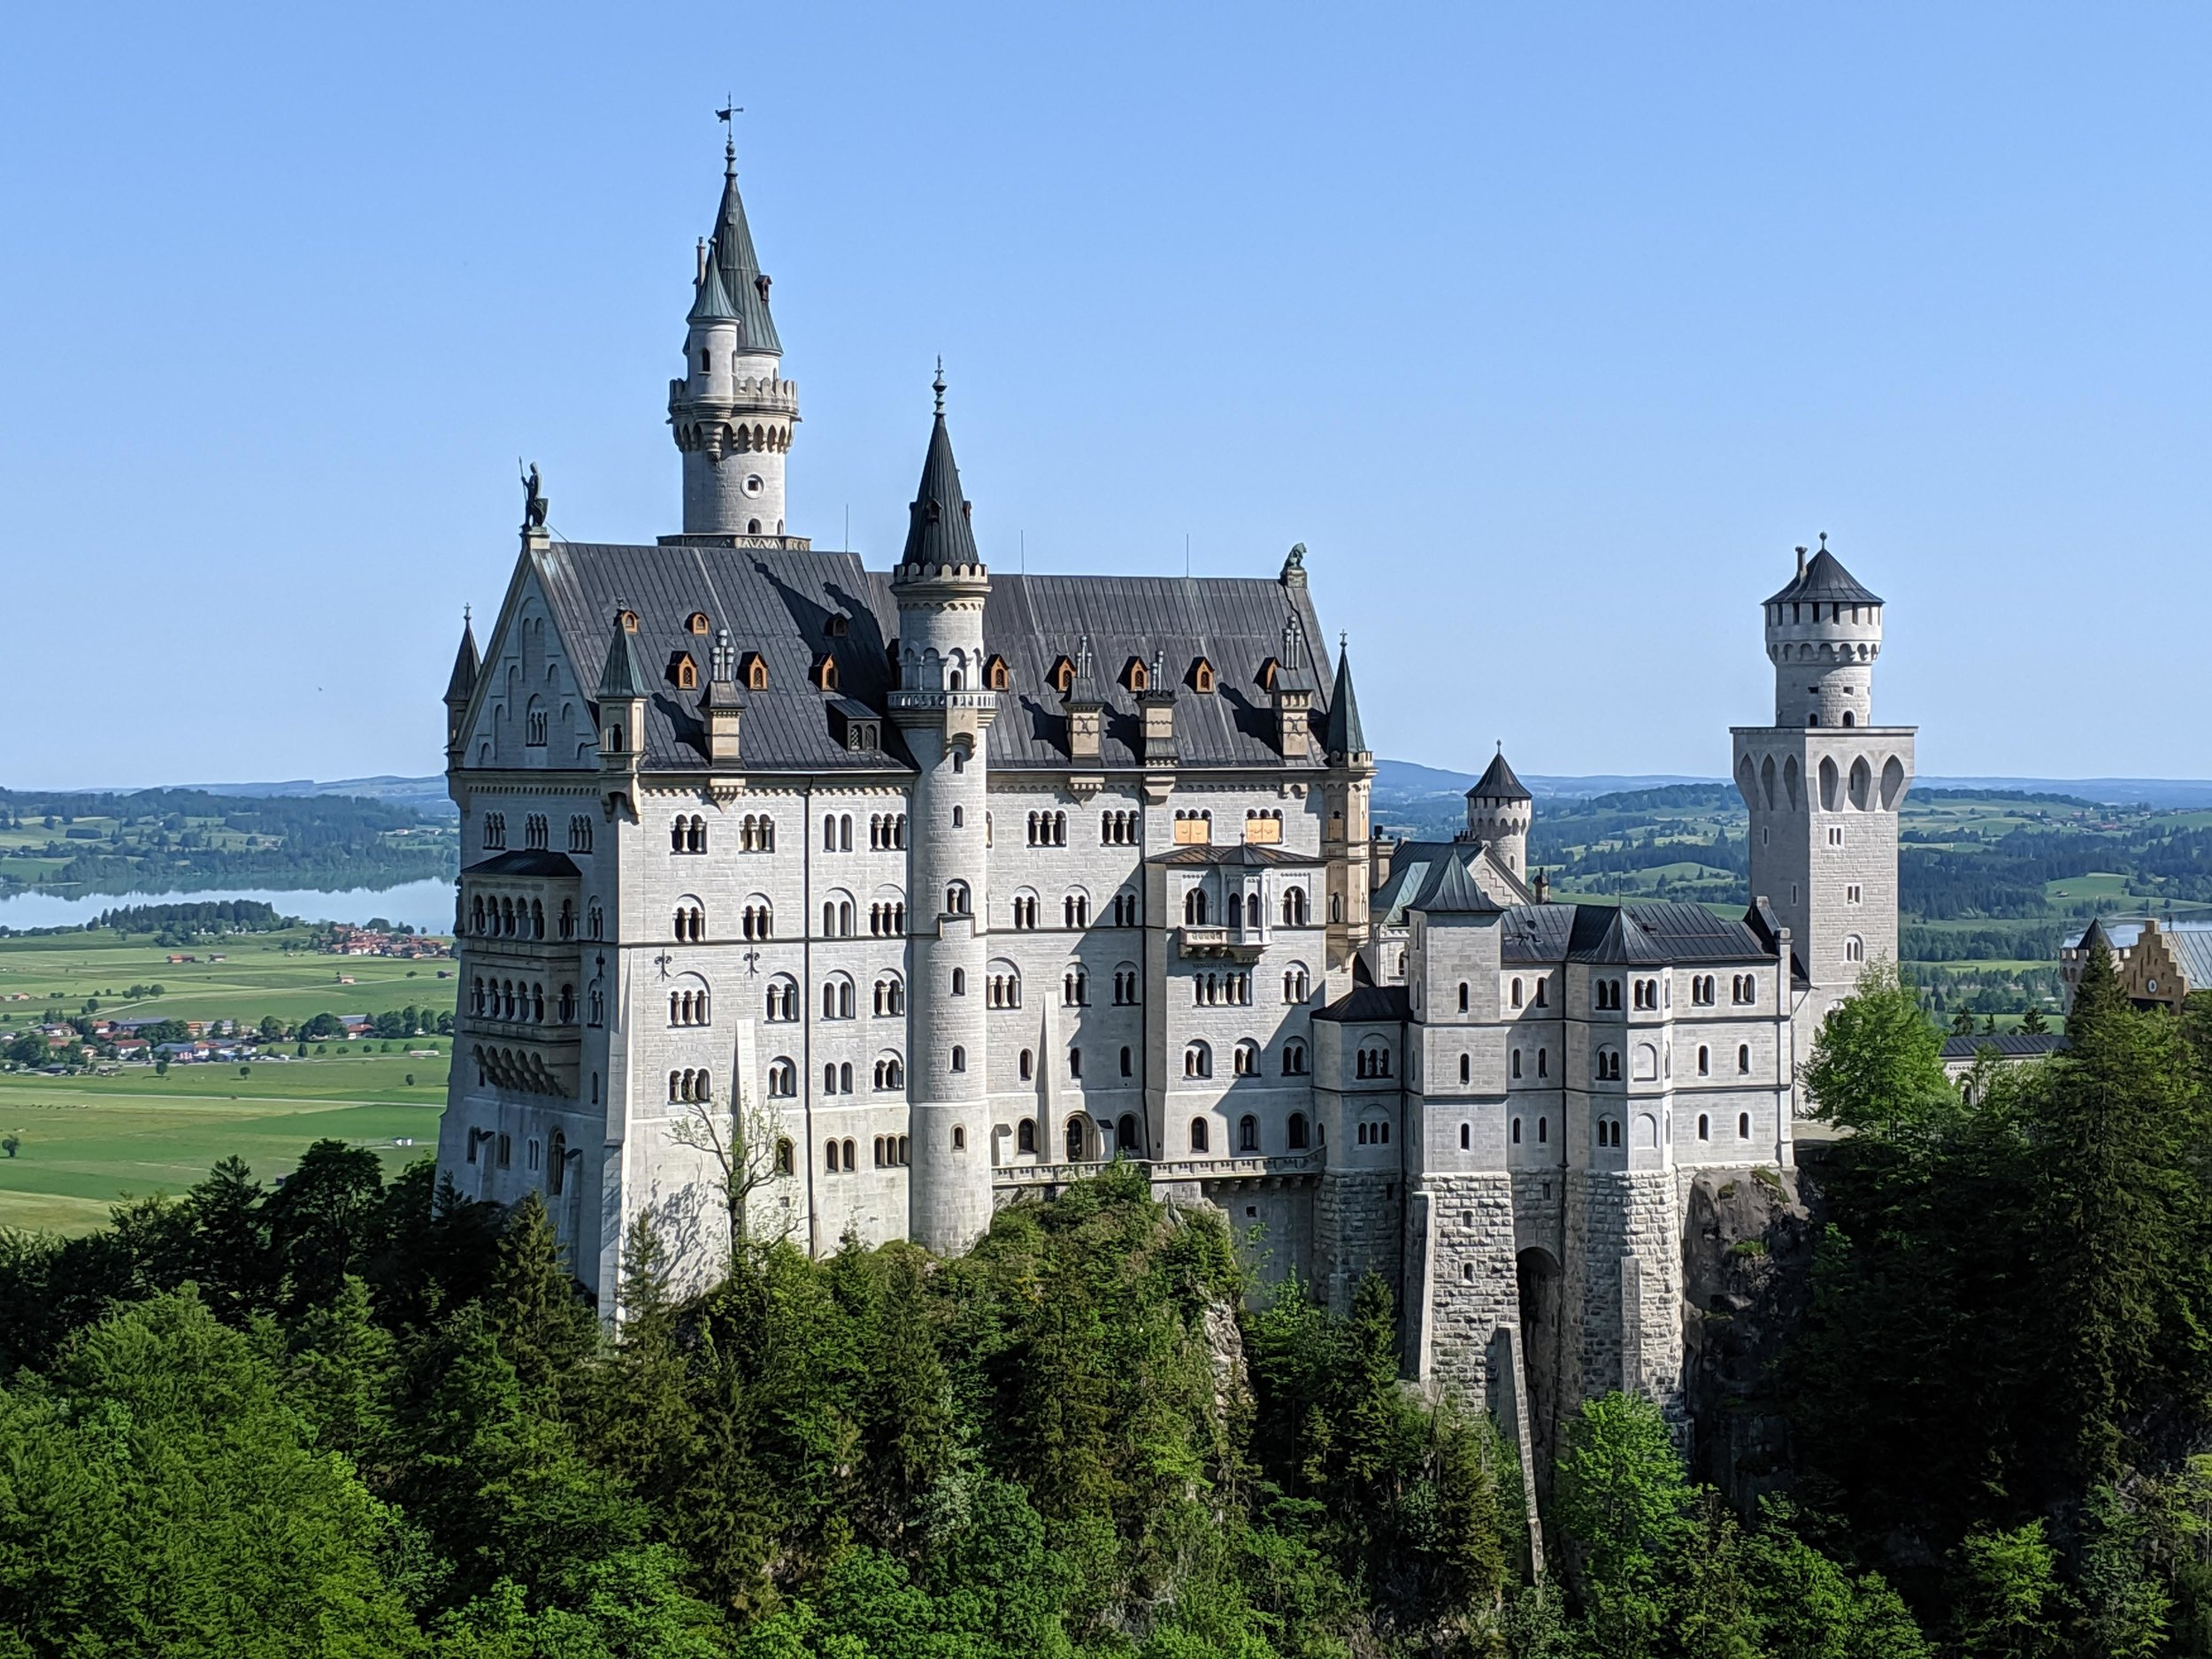 The unmistakable Neuschwanstein Castle